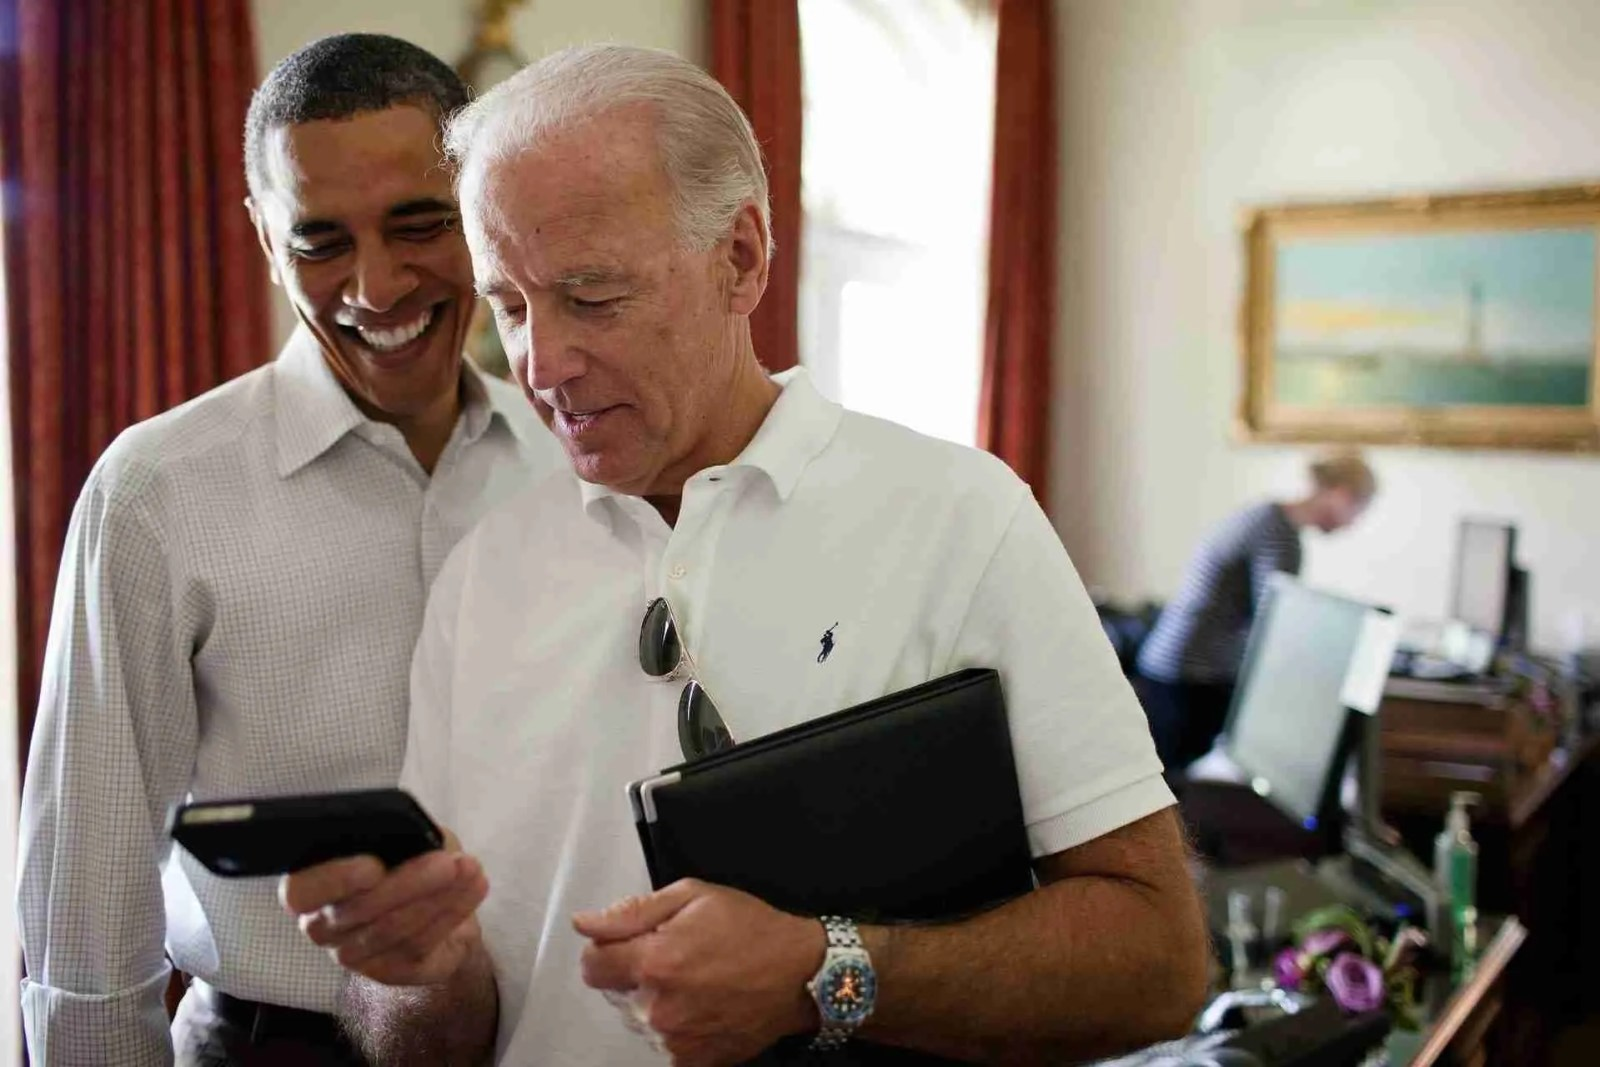 Is Joe Biden Going to Pick Obama as His Vice President? 7